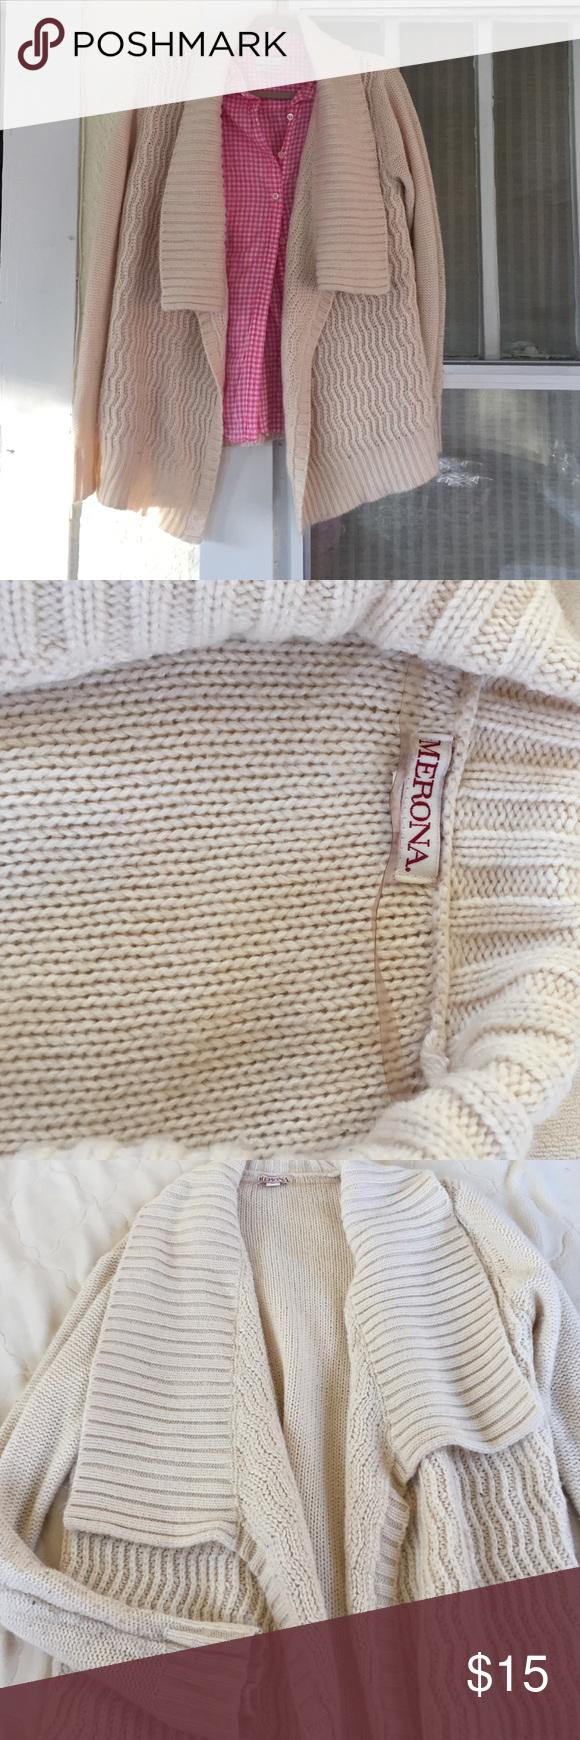 Comfy Merona sweeter in cream Merona knitted cream sweater, perfect for layering! Merona Sweaters Cardigans